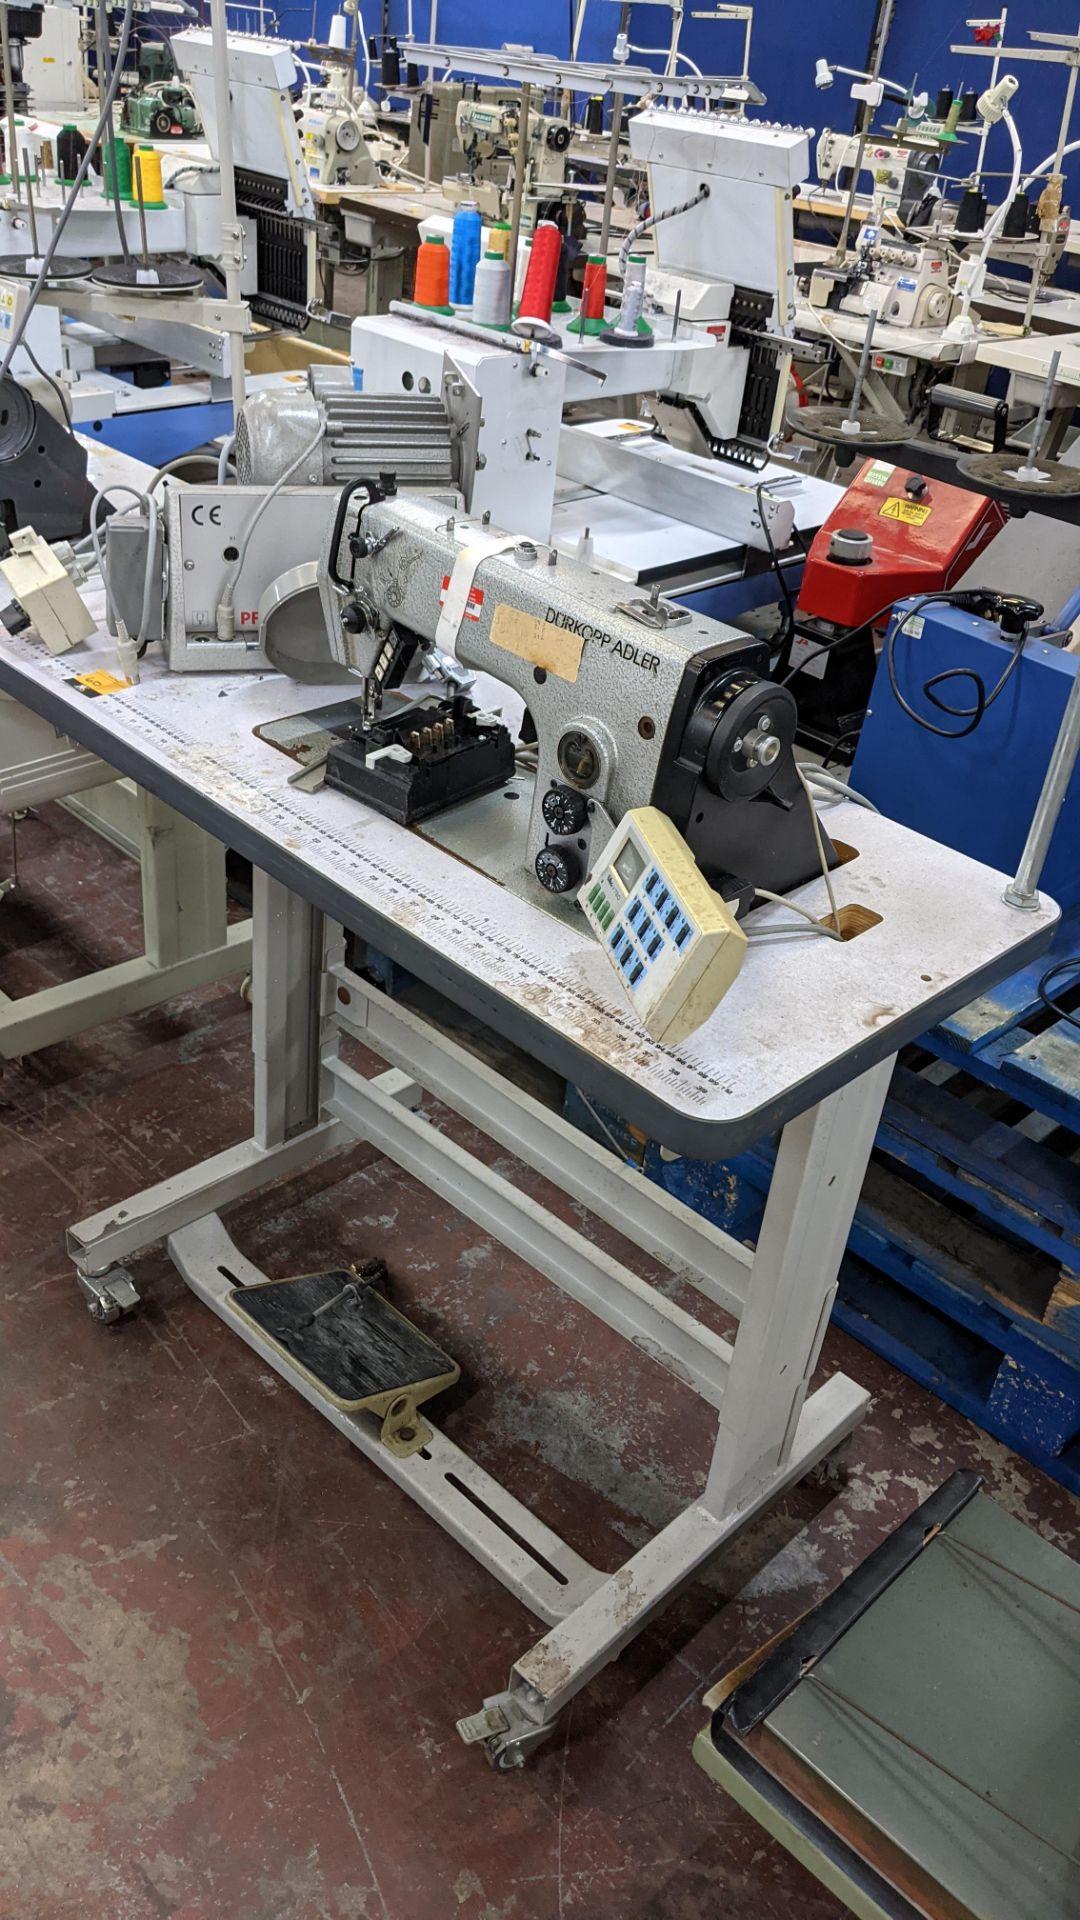 Durkopp Adler type 0271-L40042 sewing machine - Image 3 of 19